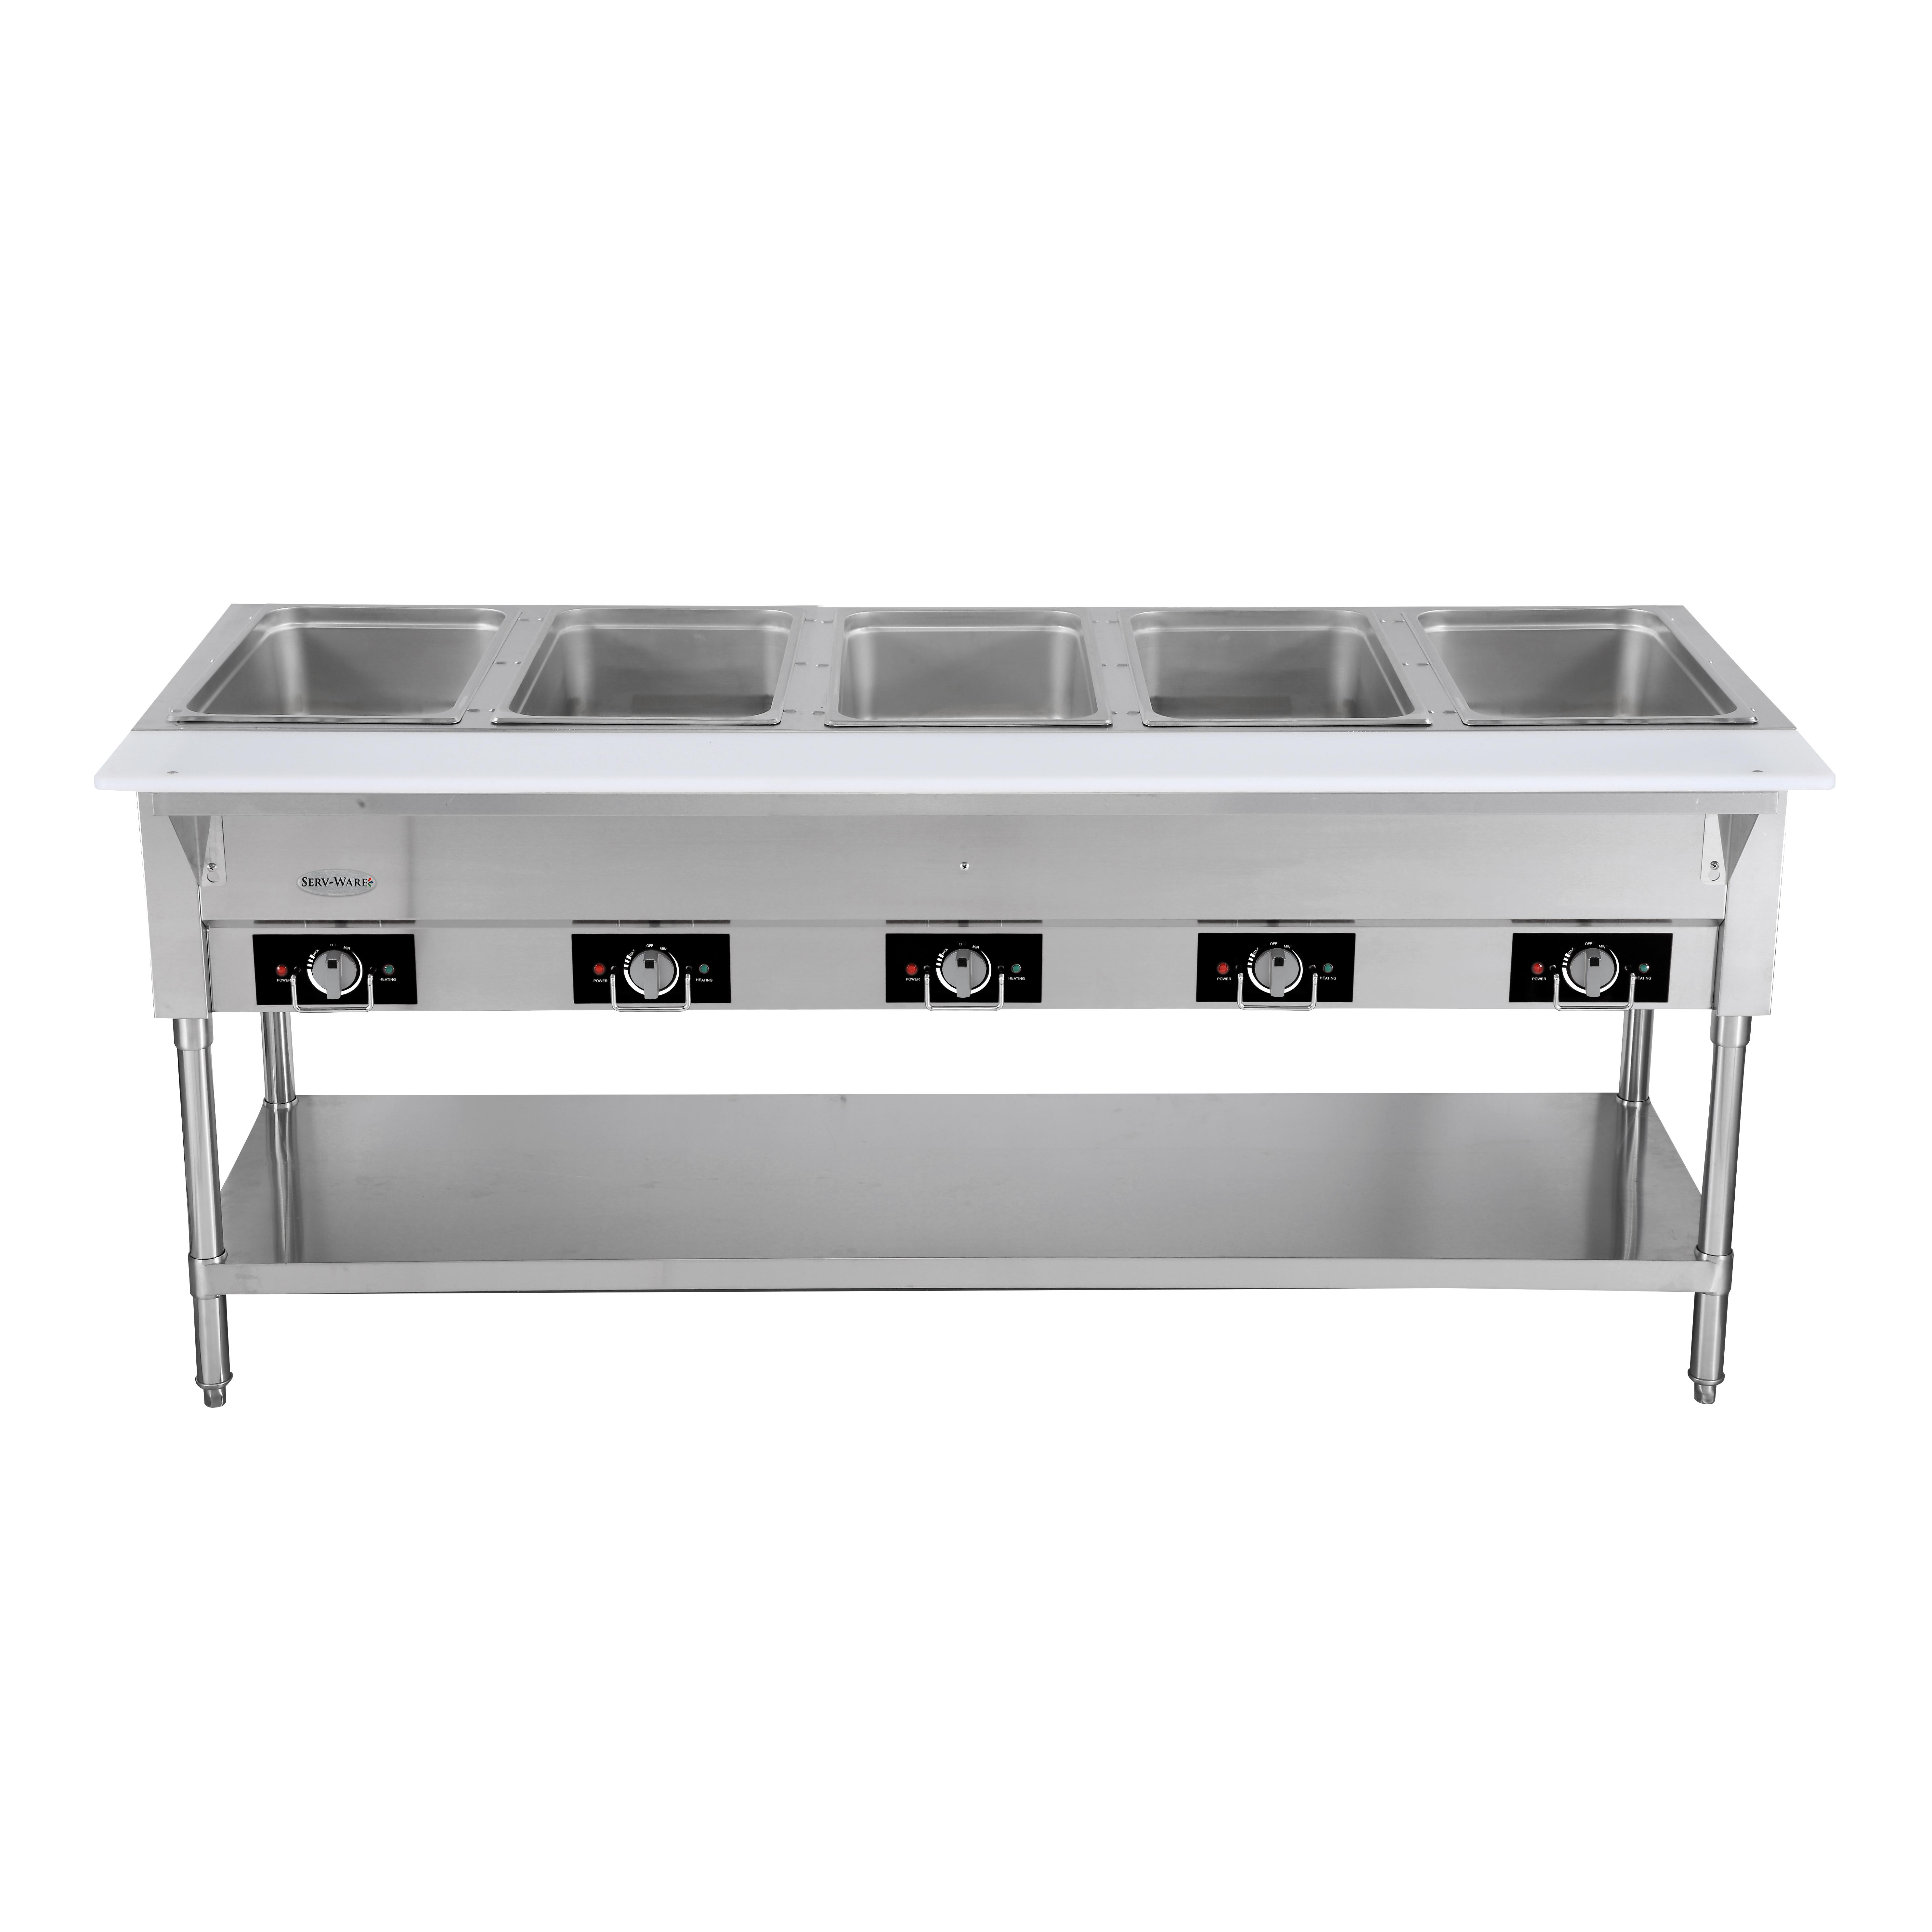 Serv-Ware EST5-2 serving counter, hot food, electric